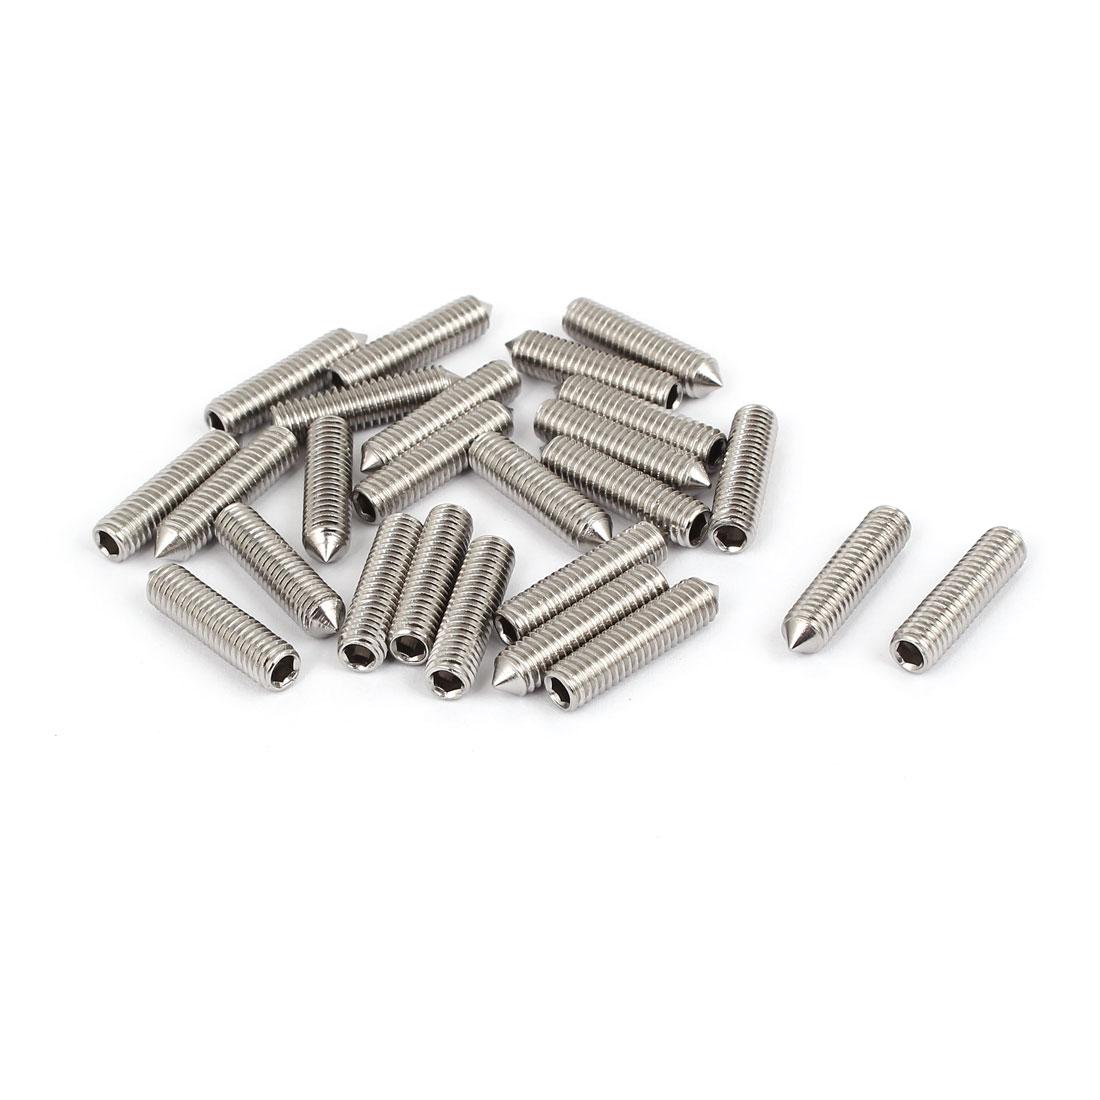 M6x25mm Stainless Steel Cone Point Grub Screws Hex Socket Set Screw 25pcs